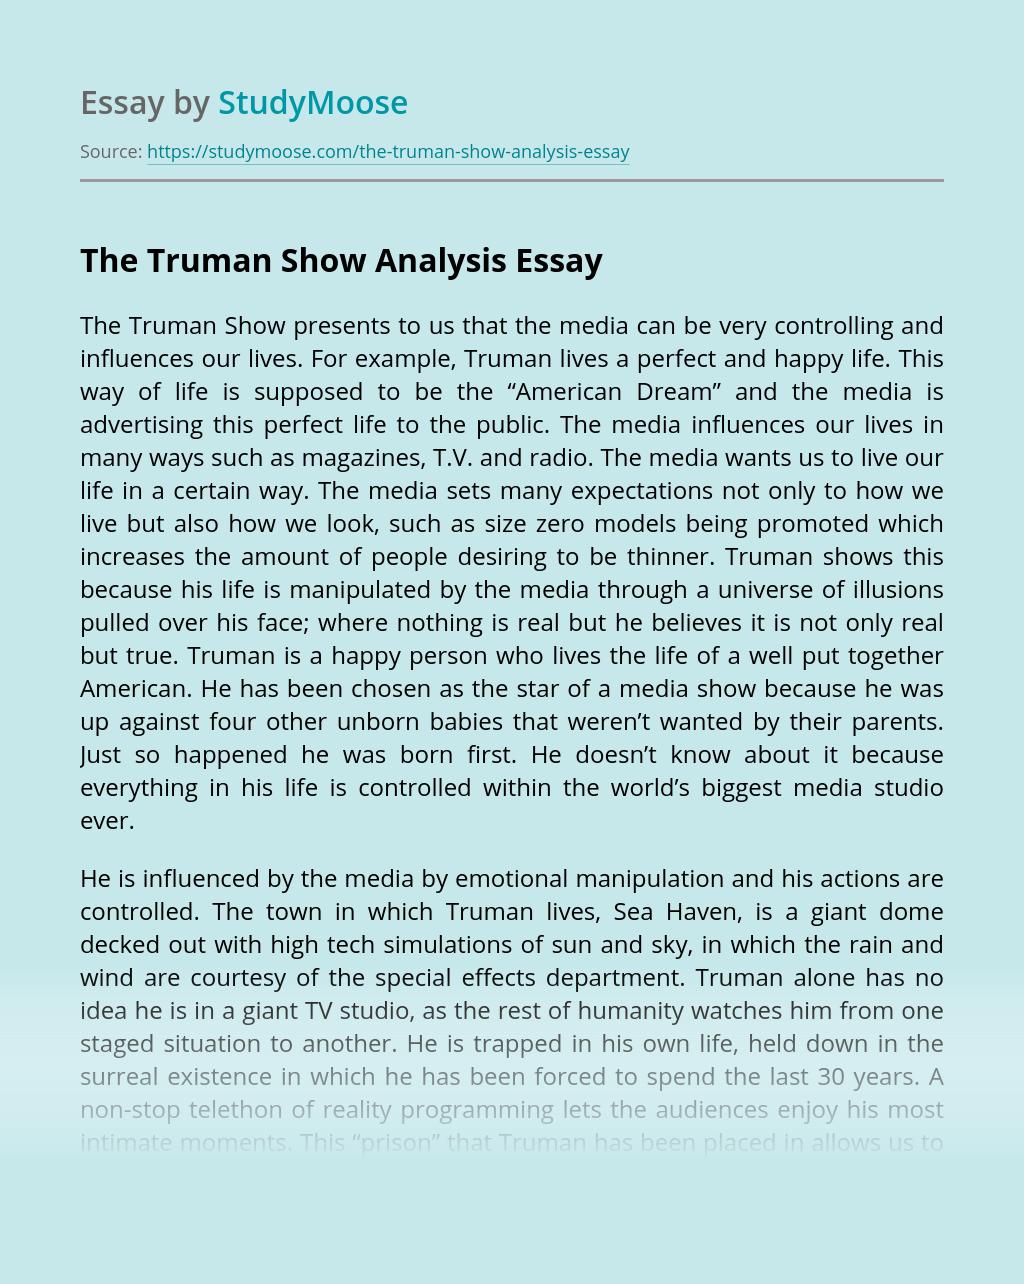 The Truman Show Analysis